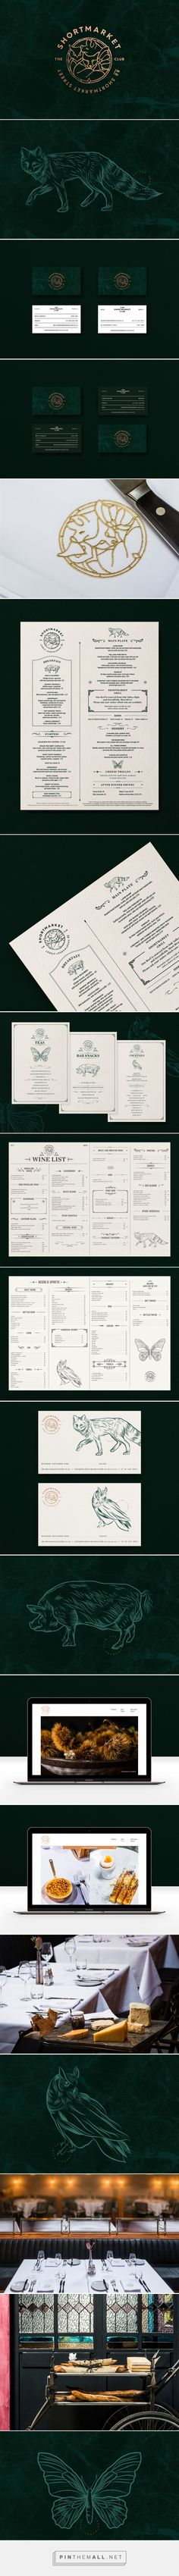 The Shortmarket Club Restaurant & Bar by Kim Van Vuuren | Fivestar Branding Agency – Design and Branding Agency & Curated Inspiration Gallery